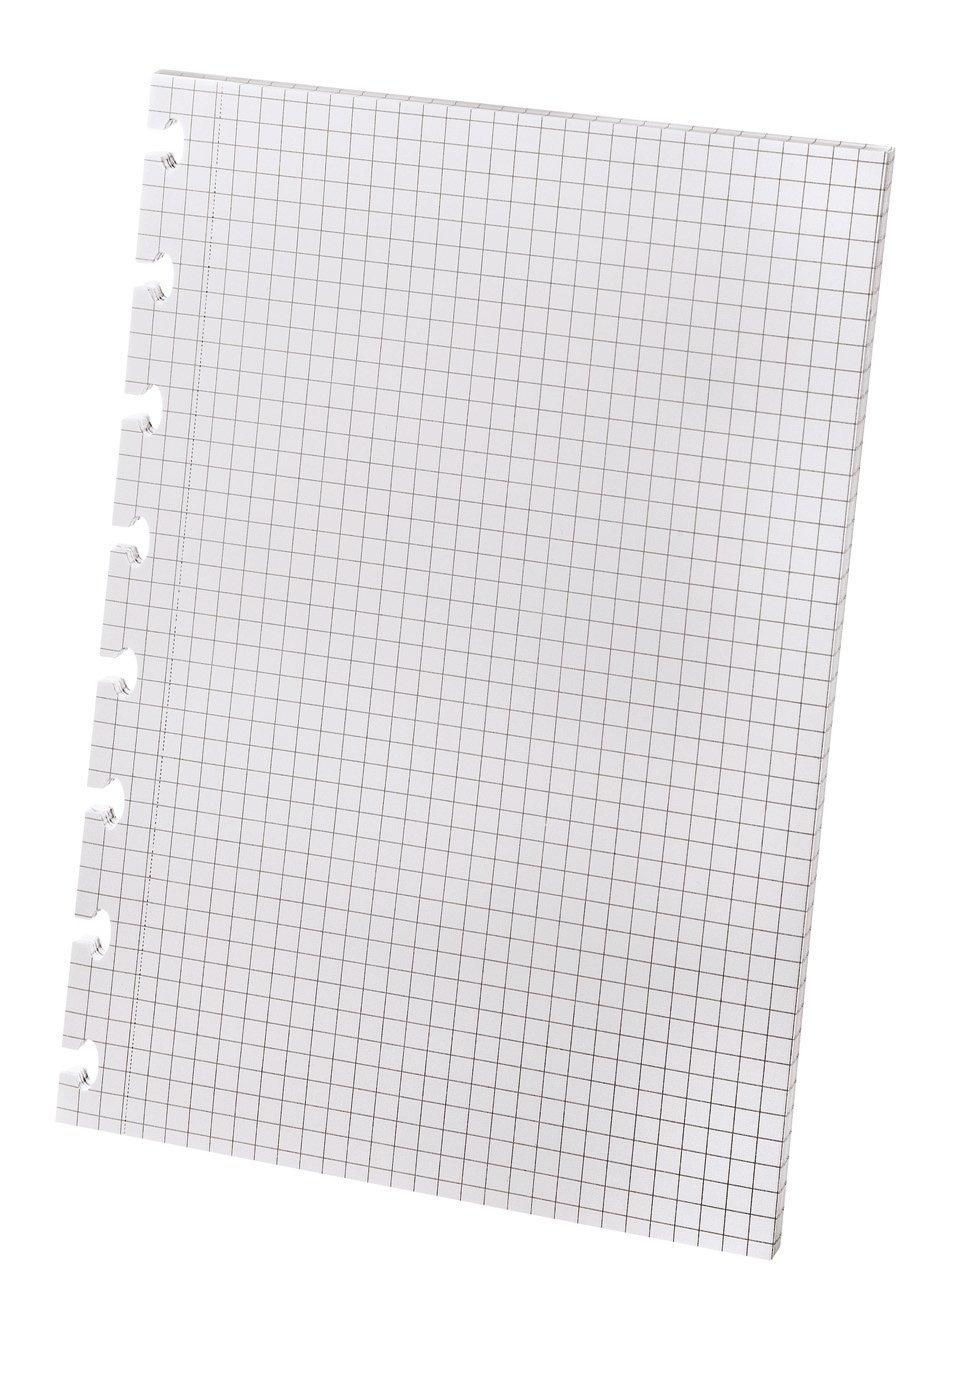 Ampad Versa Graph Paper Refill, 5-1/2'' x 8-1/2'', Graph Rule, White, 24/carton